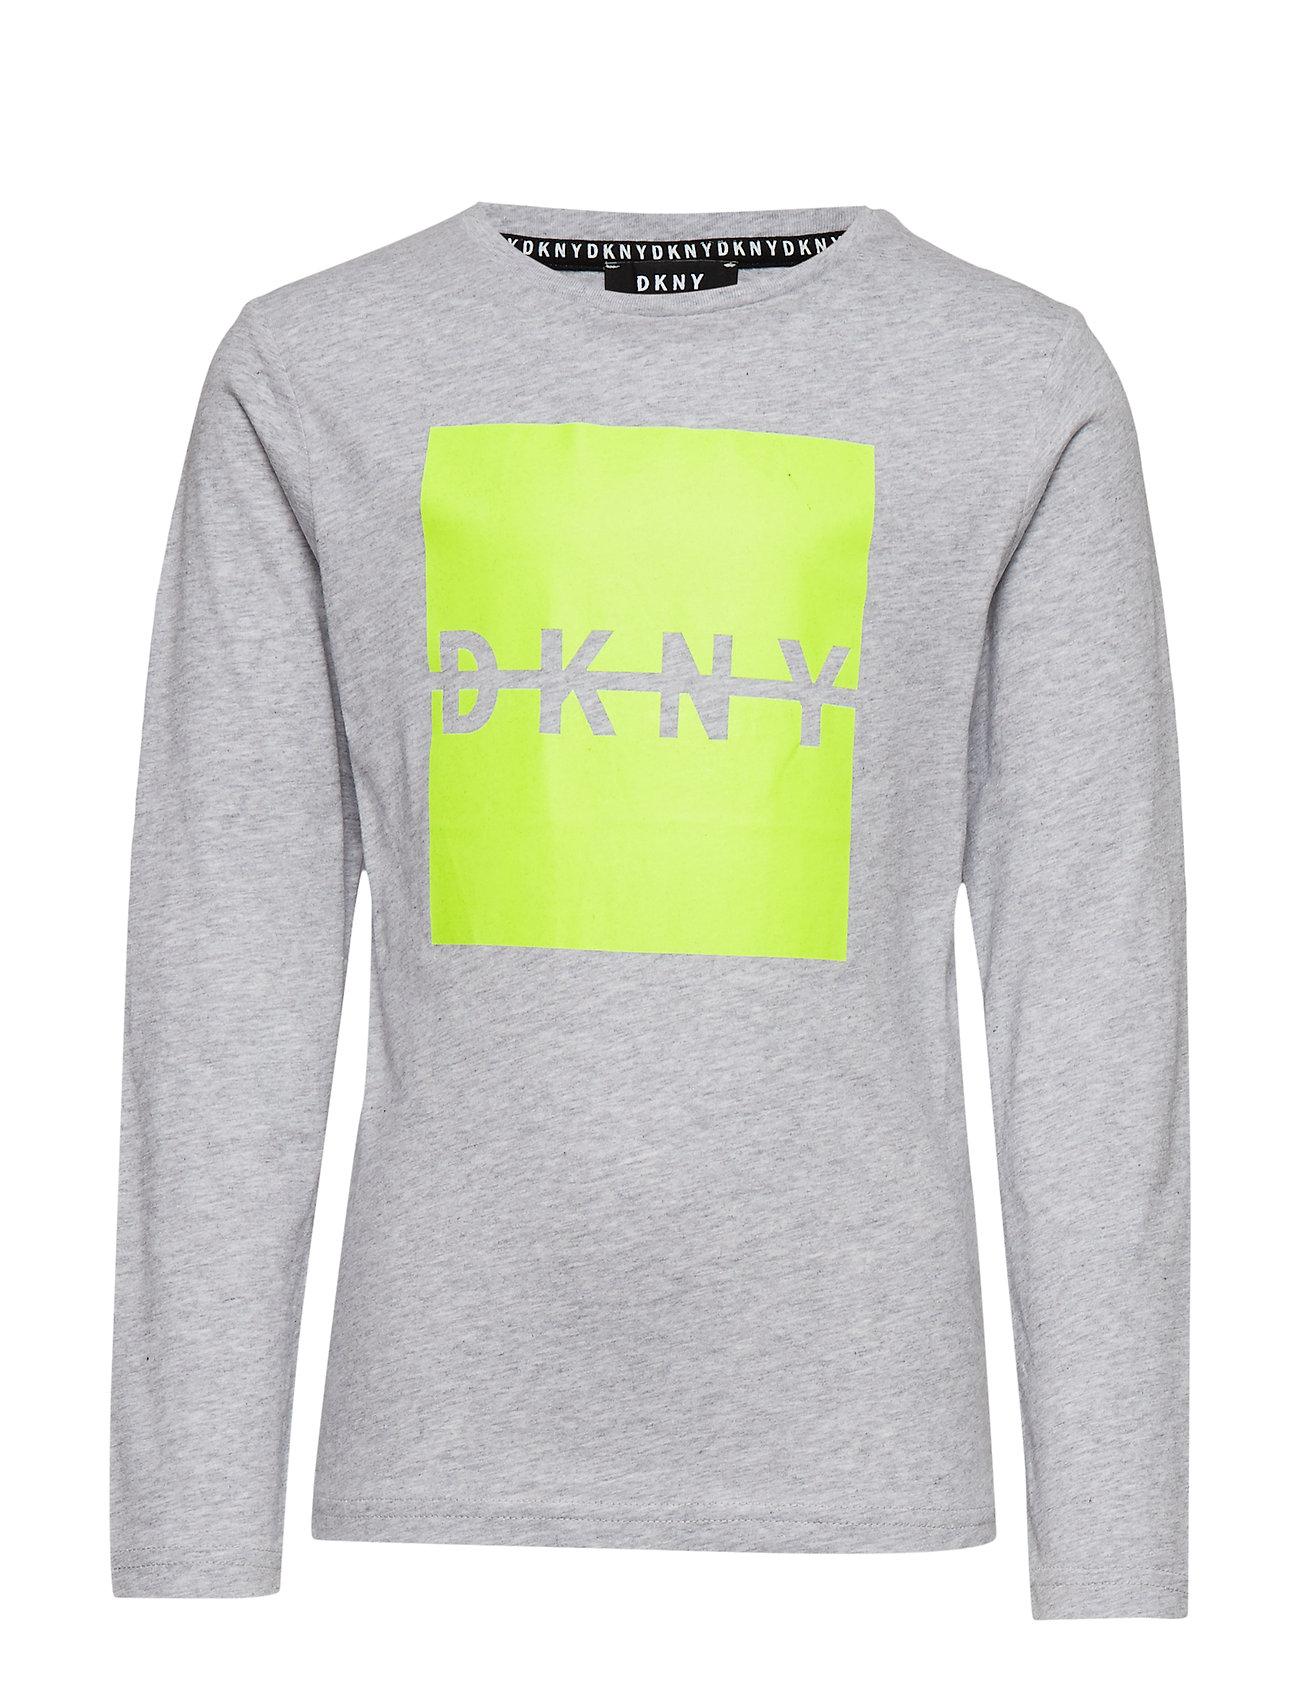 More Styles Available DKNY Boys Long Sleeve Sport Shirt